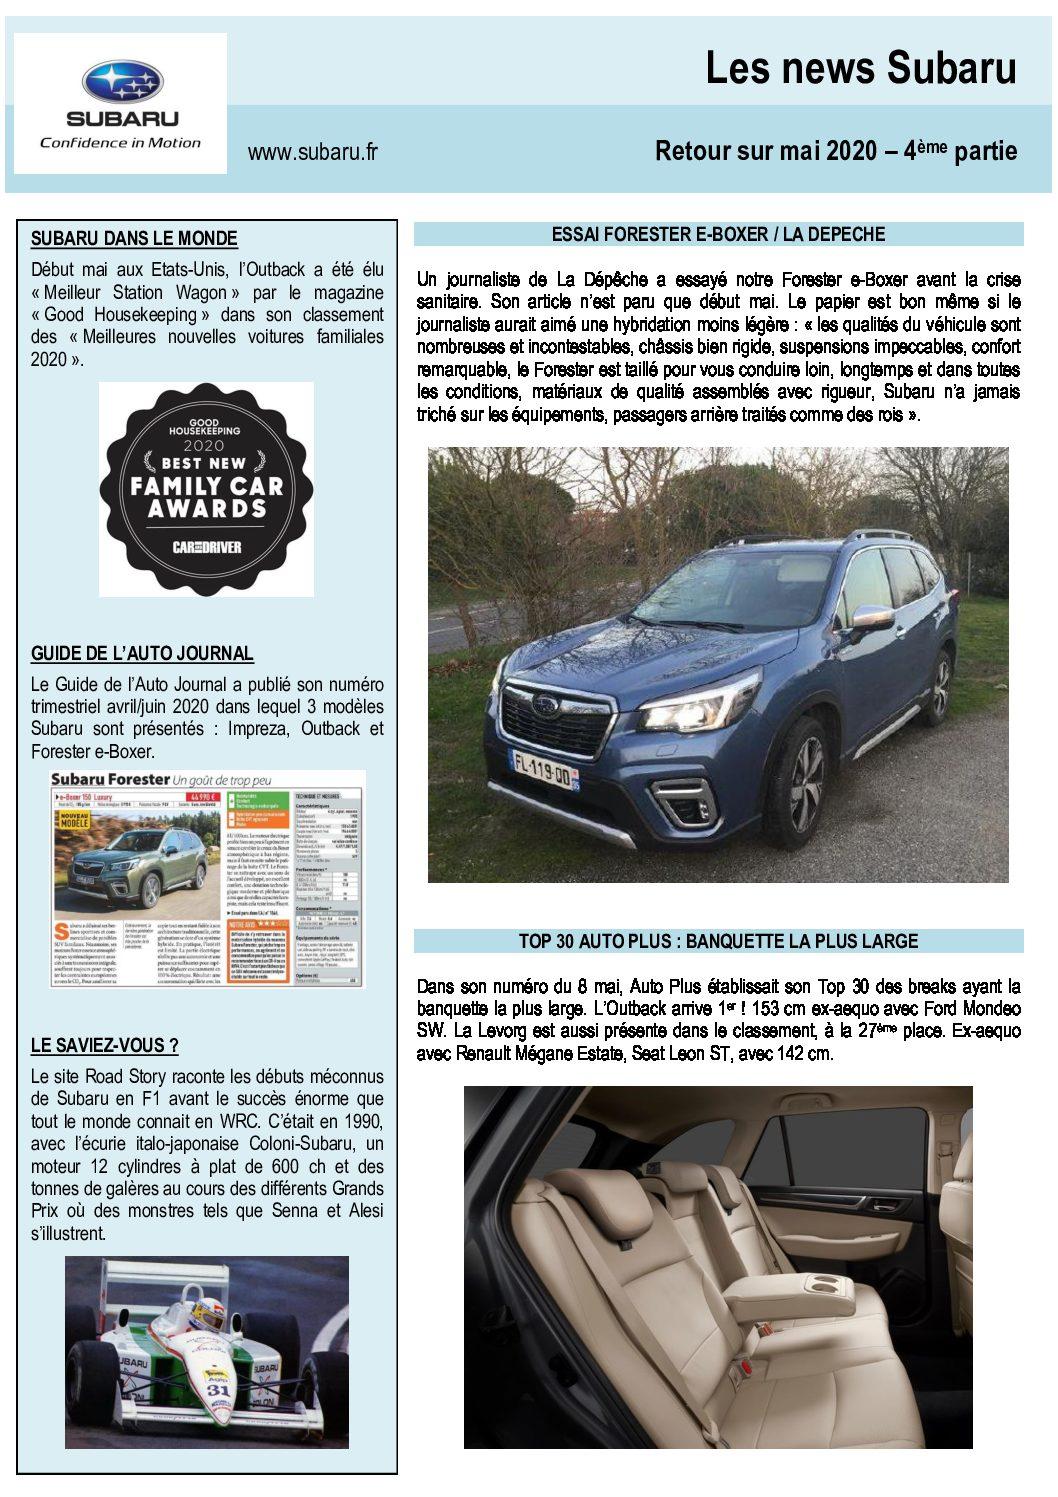 Les News Subaru – Mai 2020